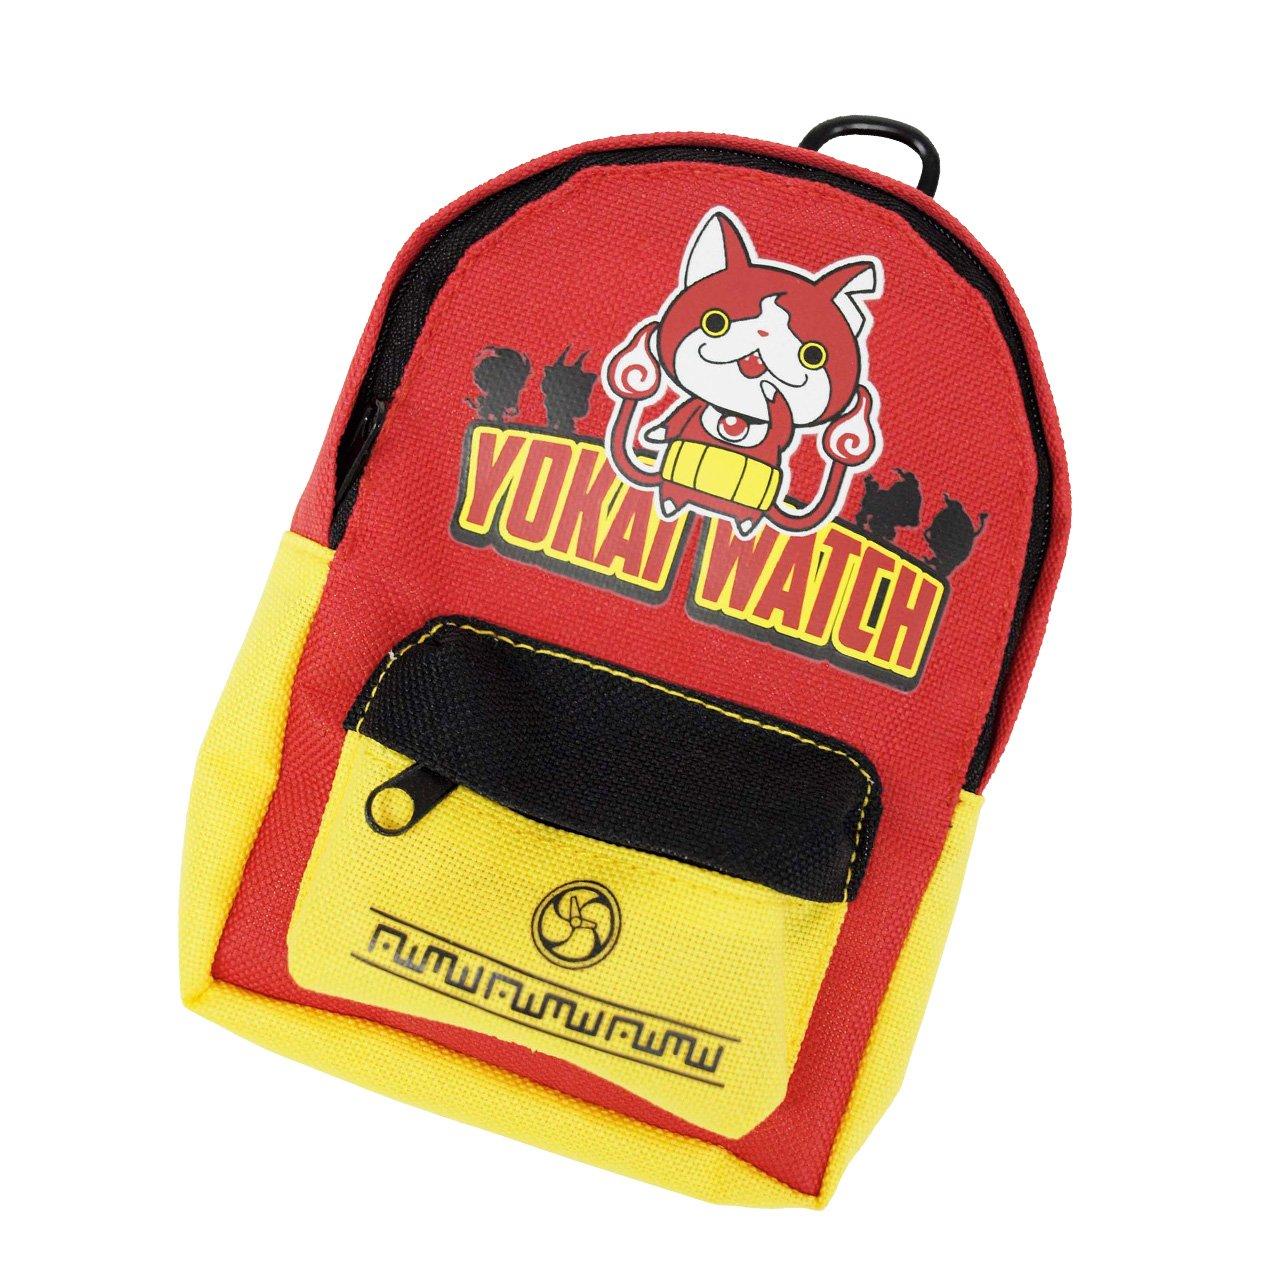 Yokai Watch carabiner-type backpack pouch [Jibanyan] by ...